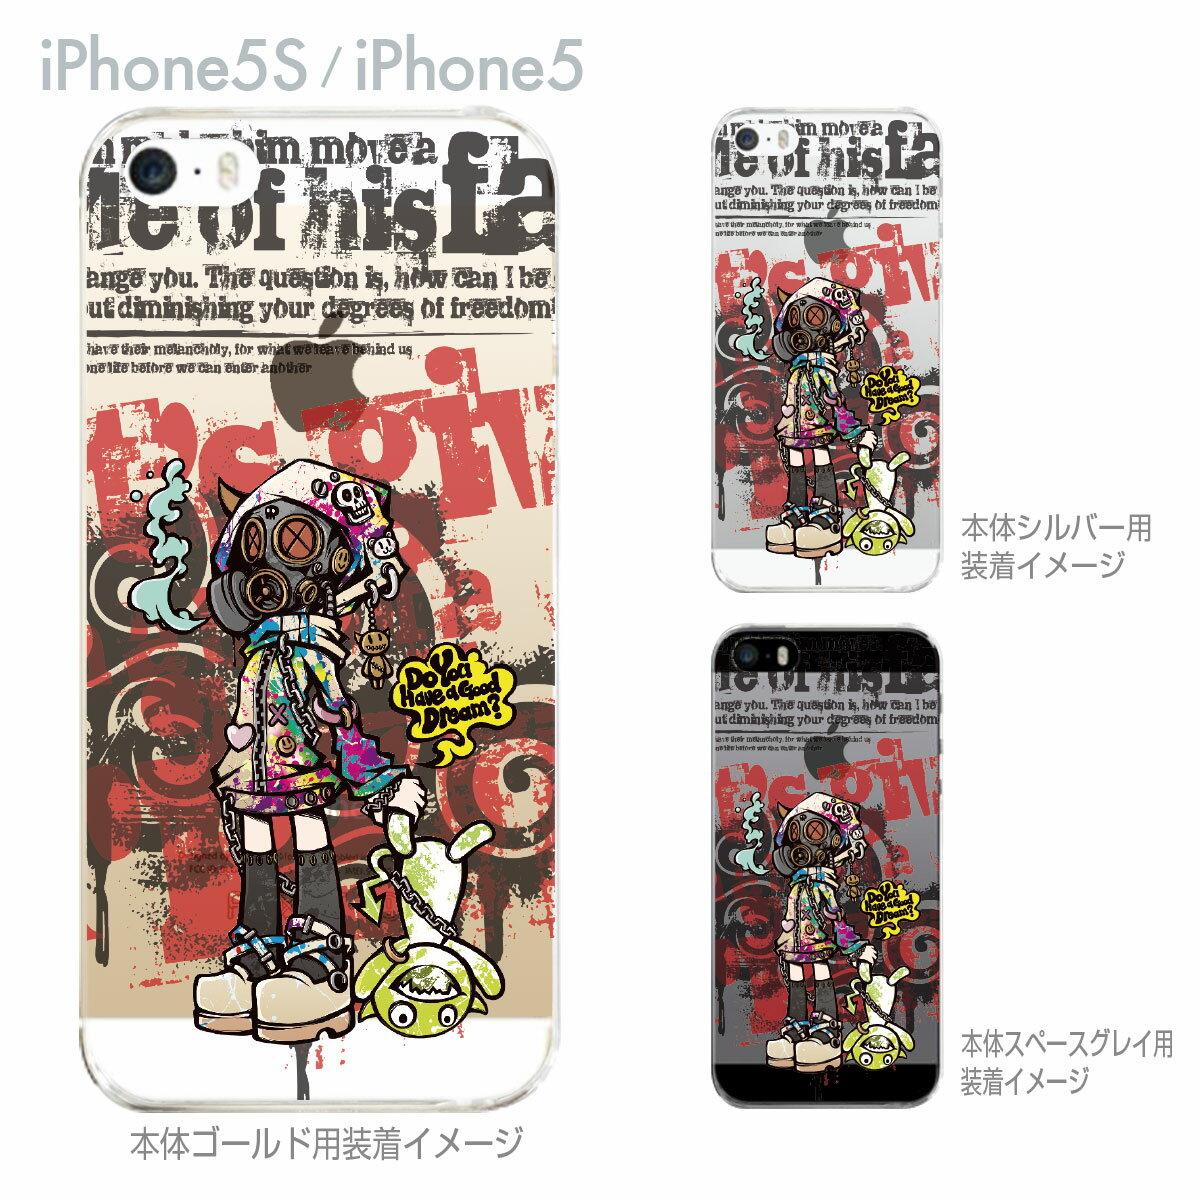 iPhone5s iPhone5 iPhone SE Clear Arts iPhone ケース カバー スマホケース クリアケース ハードケース【Project.C.K.】【プロジェクトシーケー】【GASMASK】 11-ip5s-ck0005s